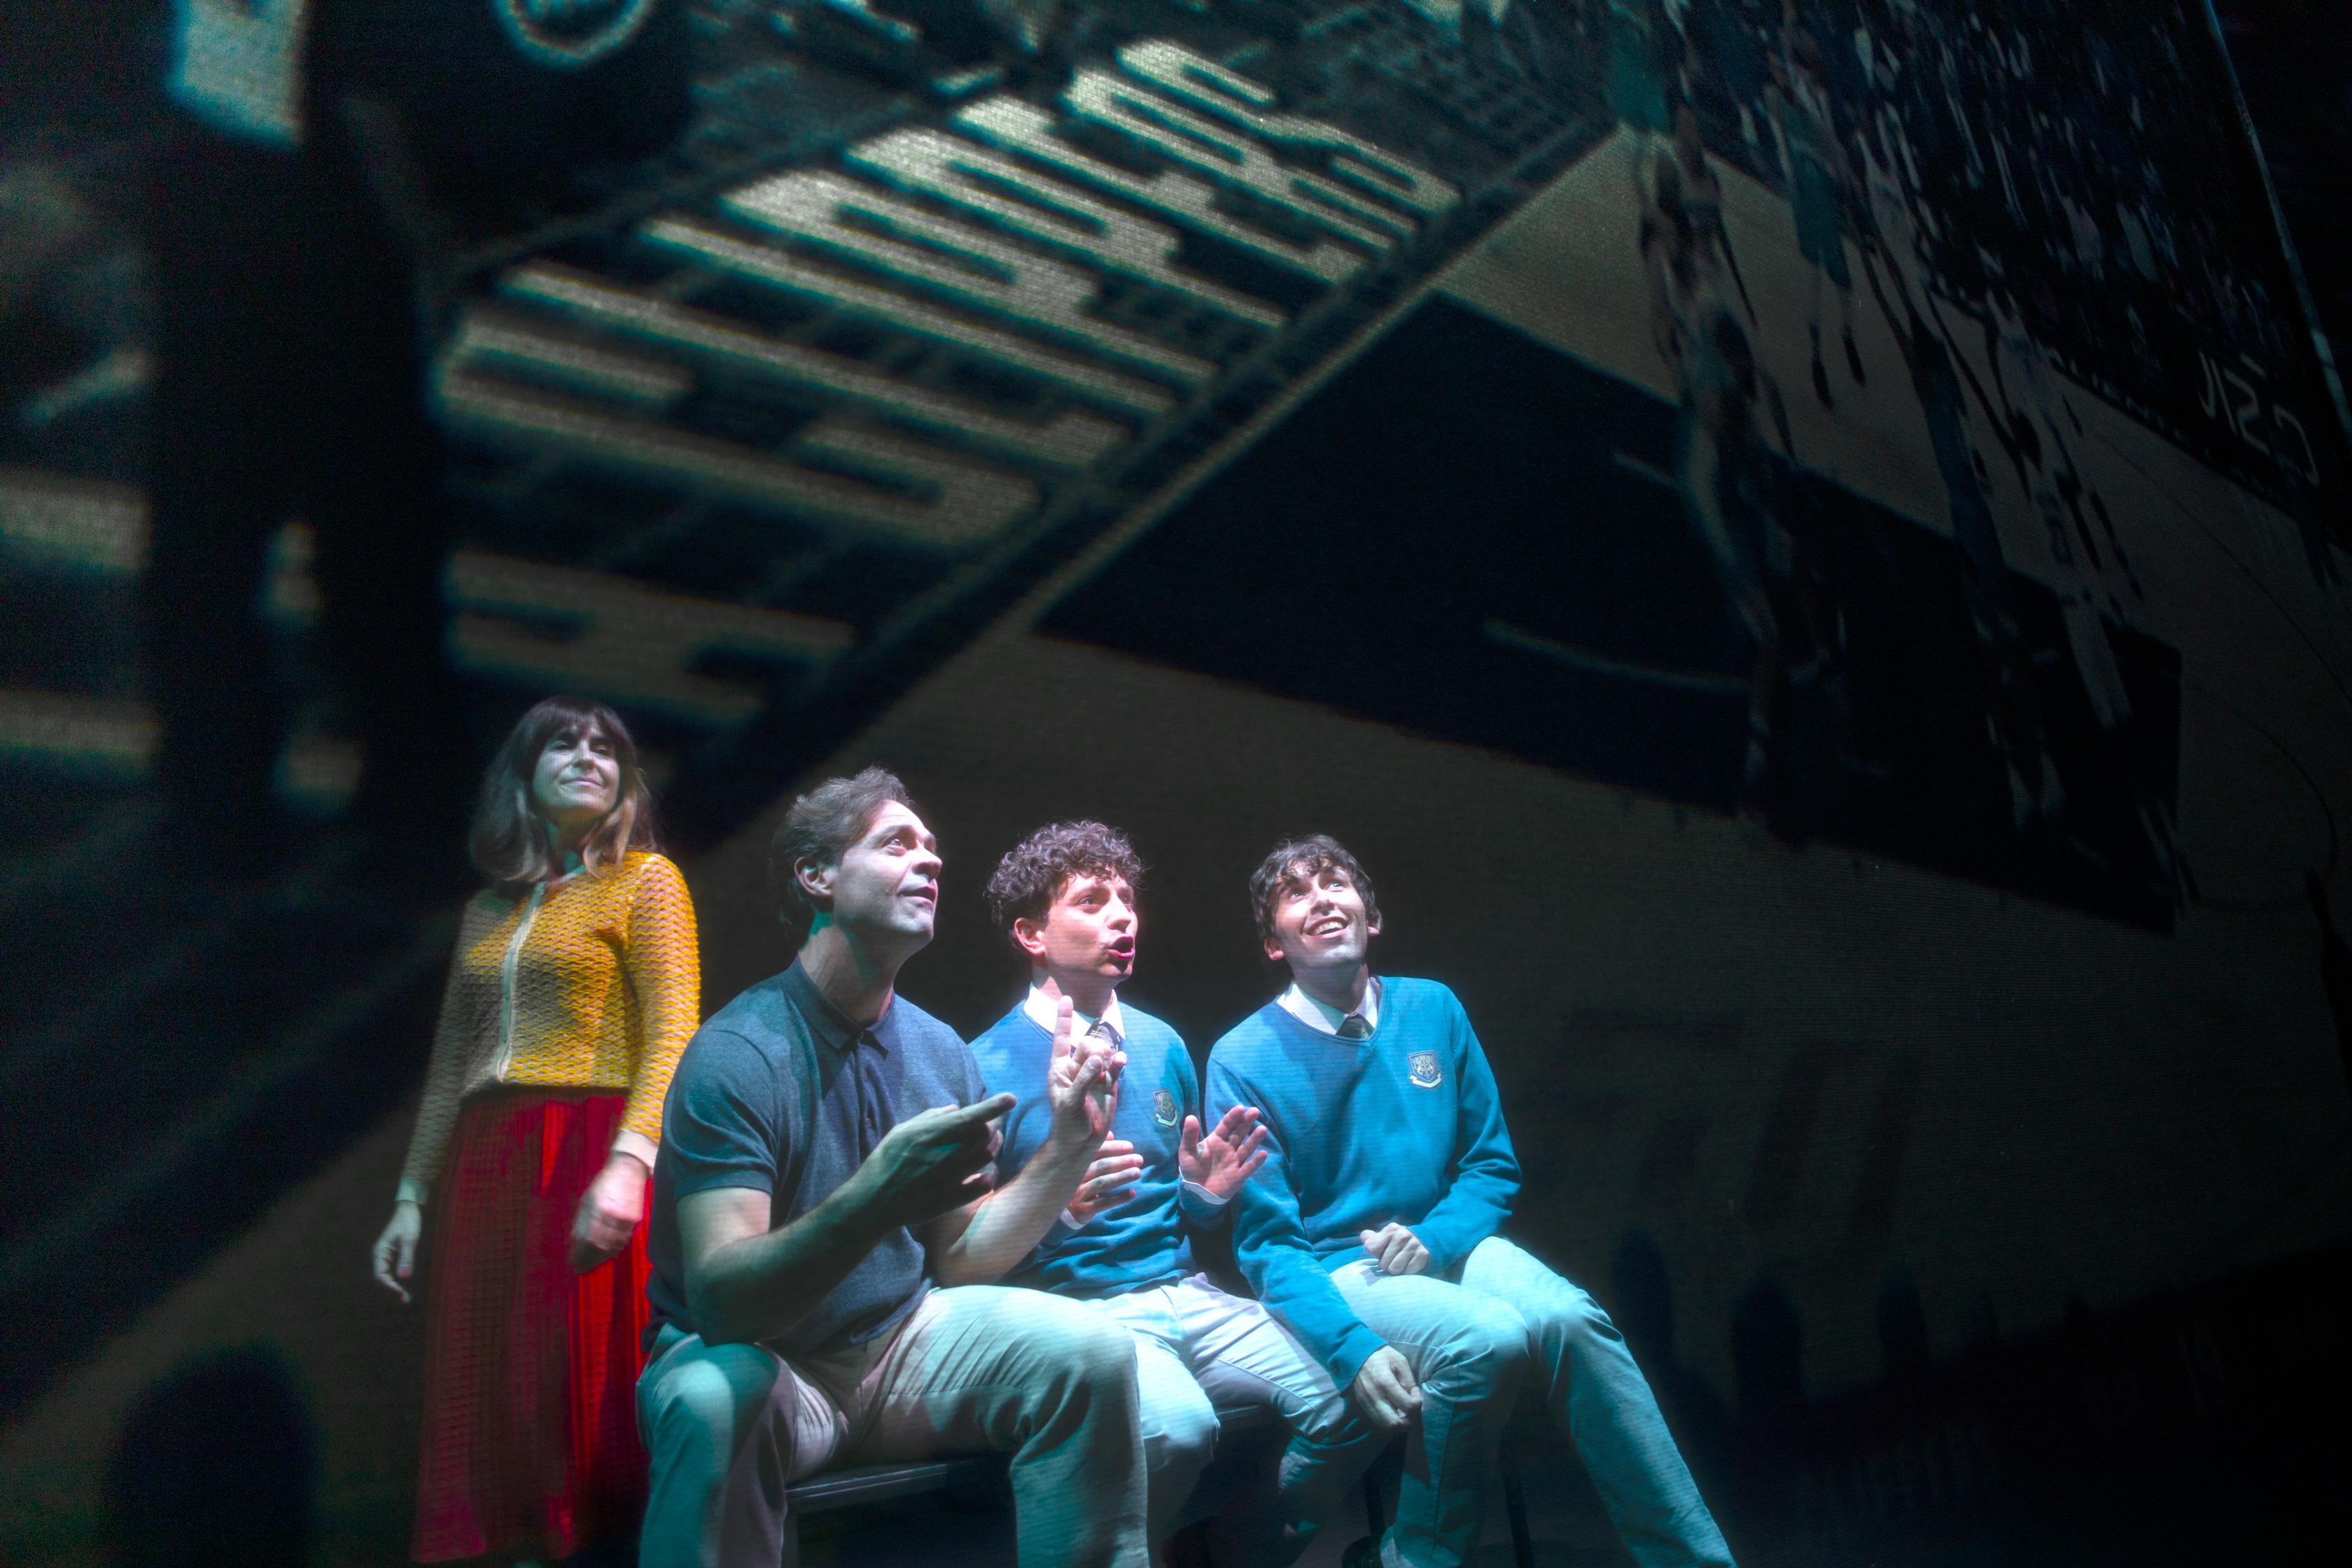 Redrum teatro estrea esta semana 'O mozo da última fila' de Juan Mayorga